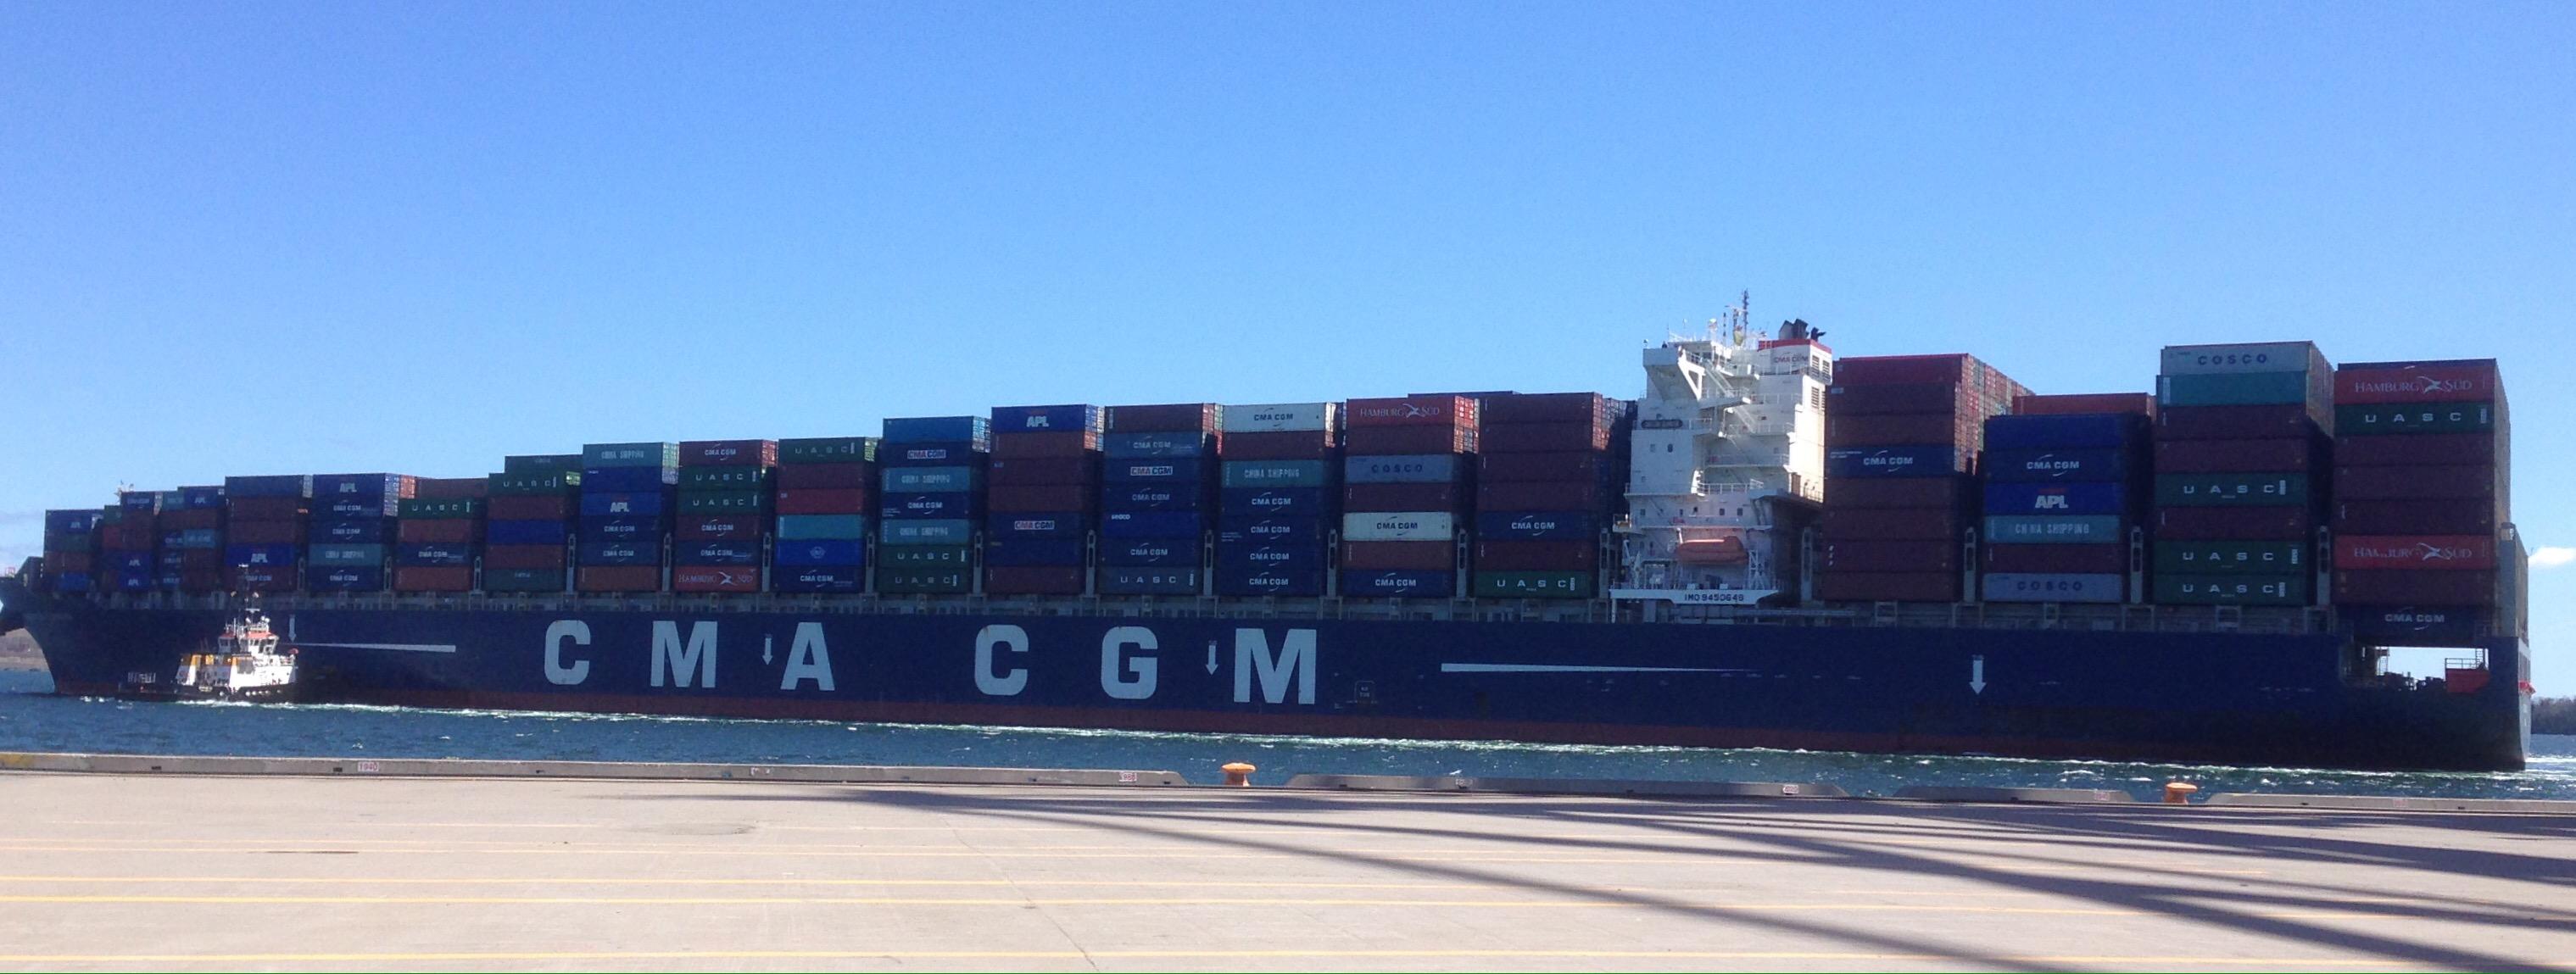 CMA-CGM | Halifax Shipping News ca